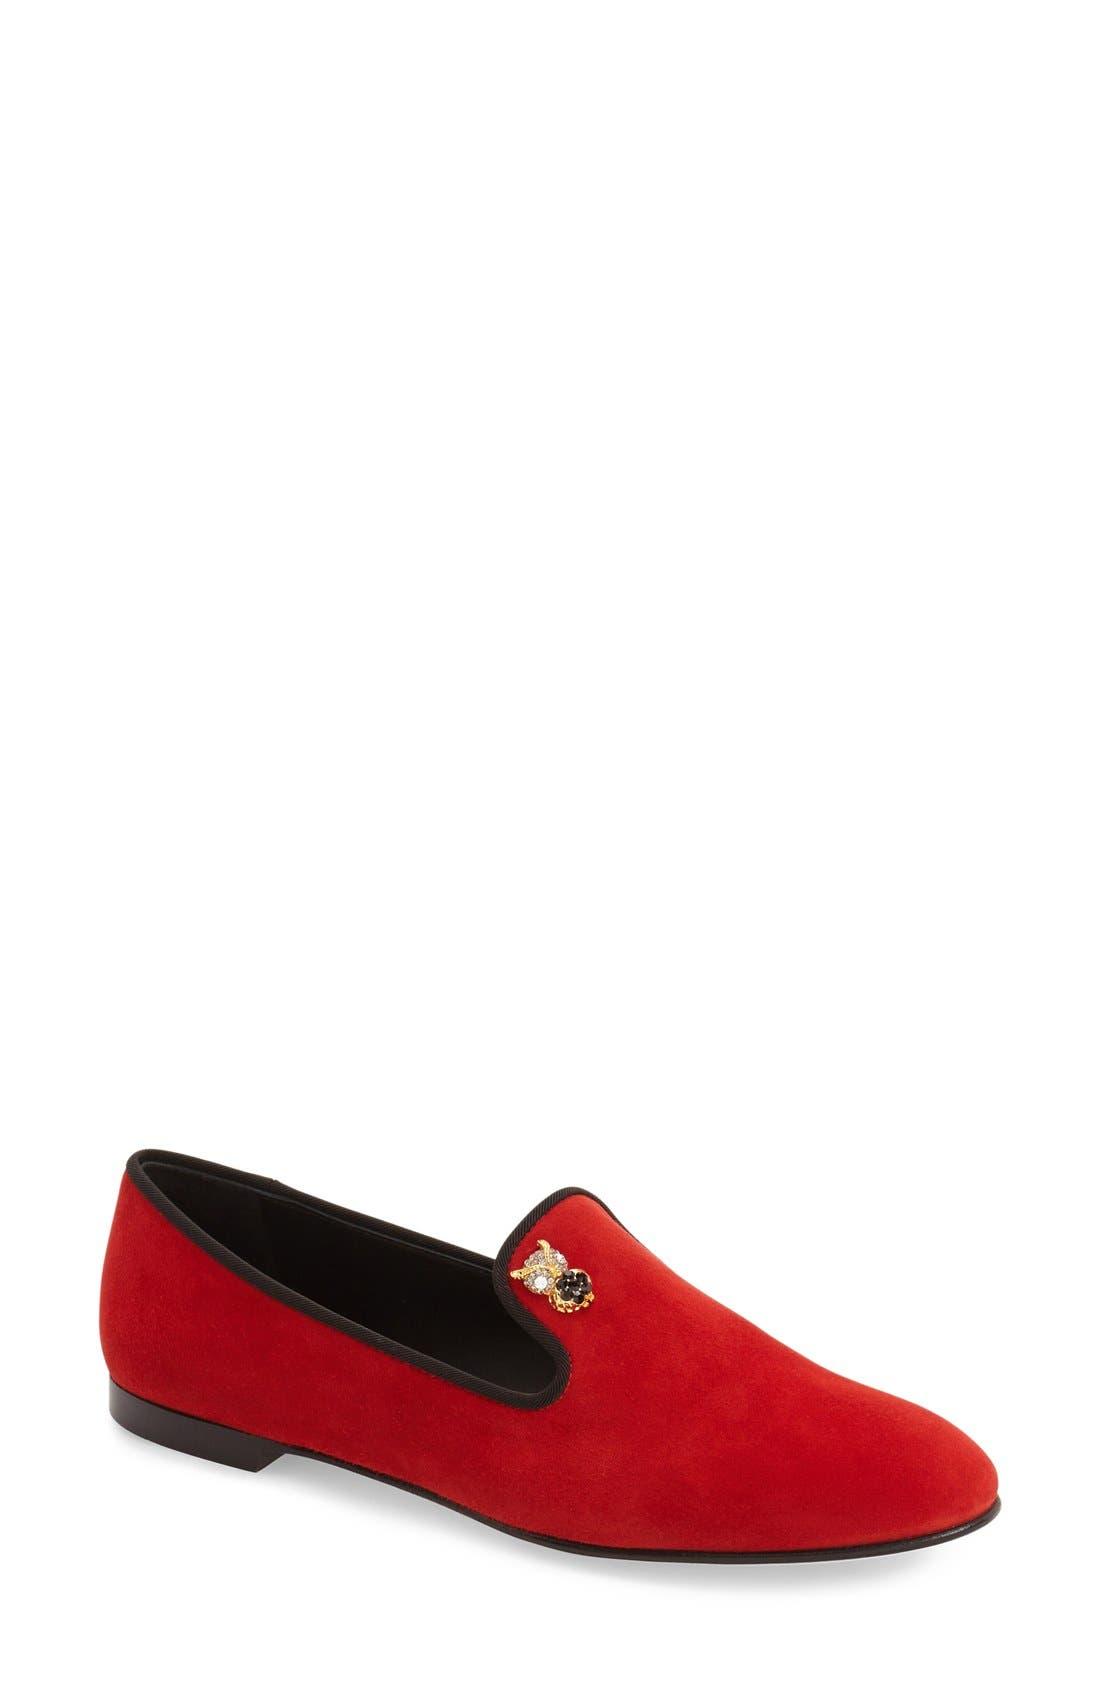 'Dalila' Loafer, Main, color, 601